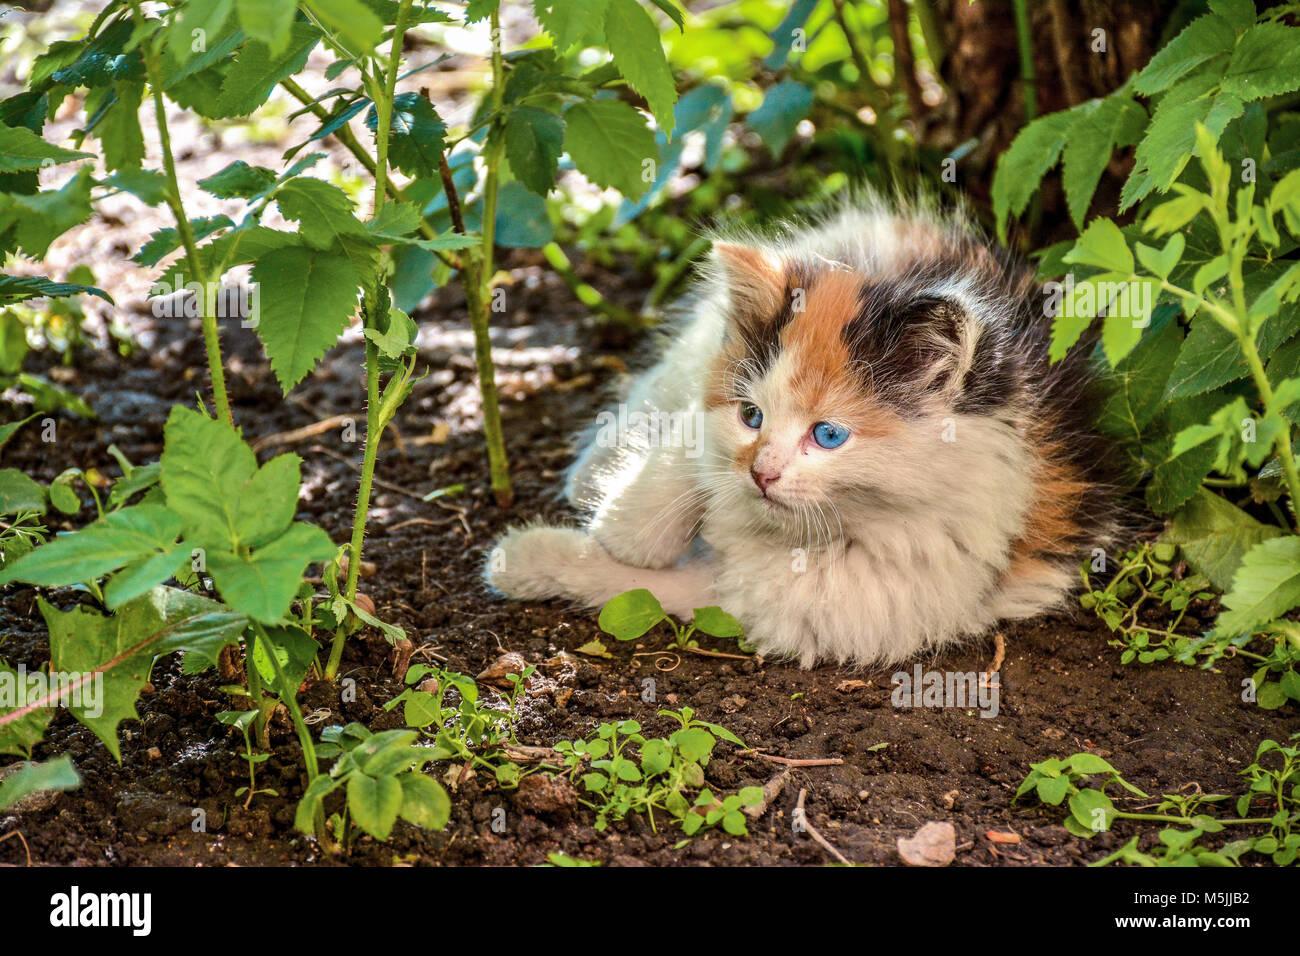 revolution cat flea treatment amazon